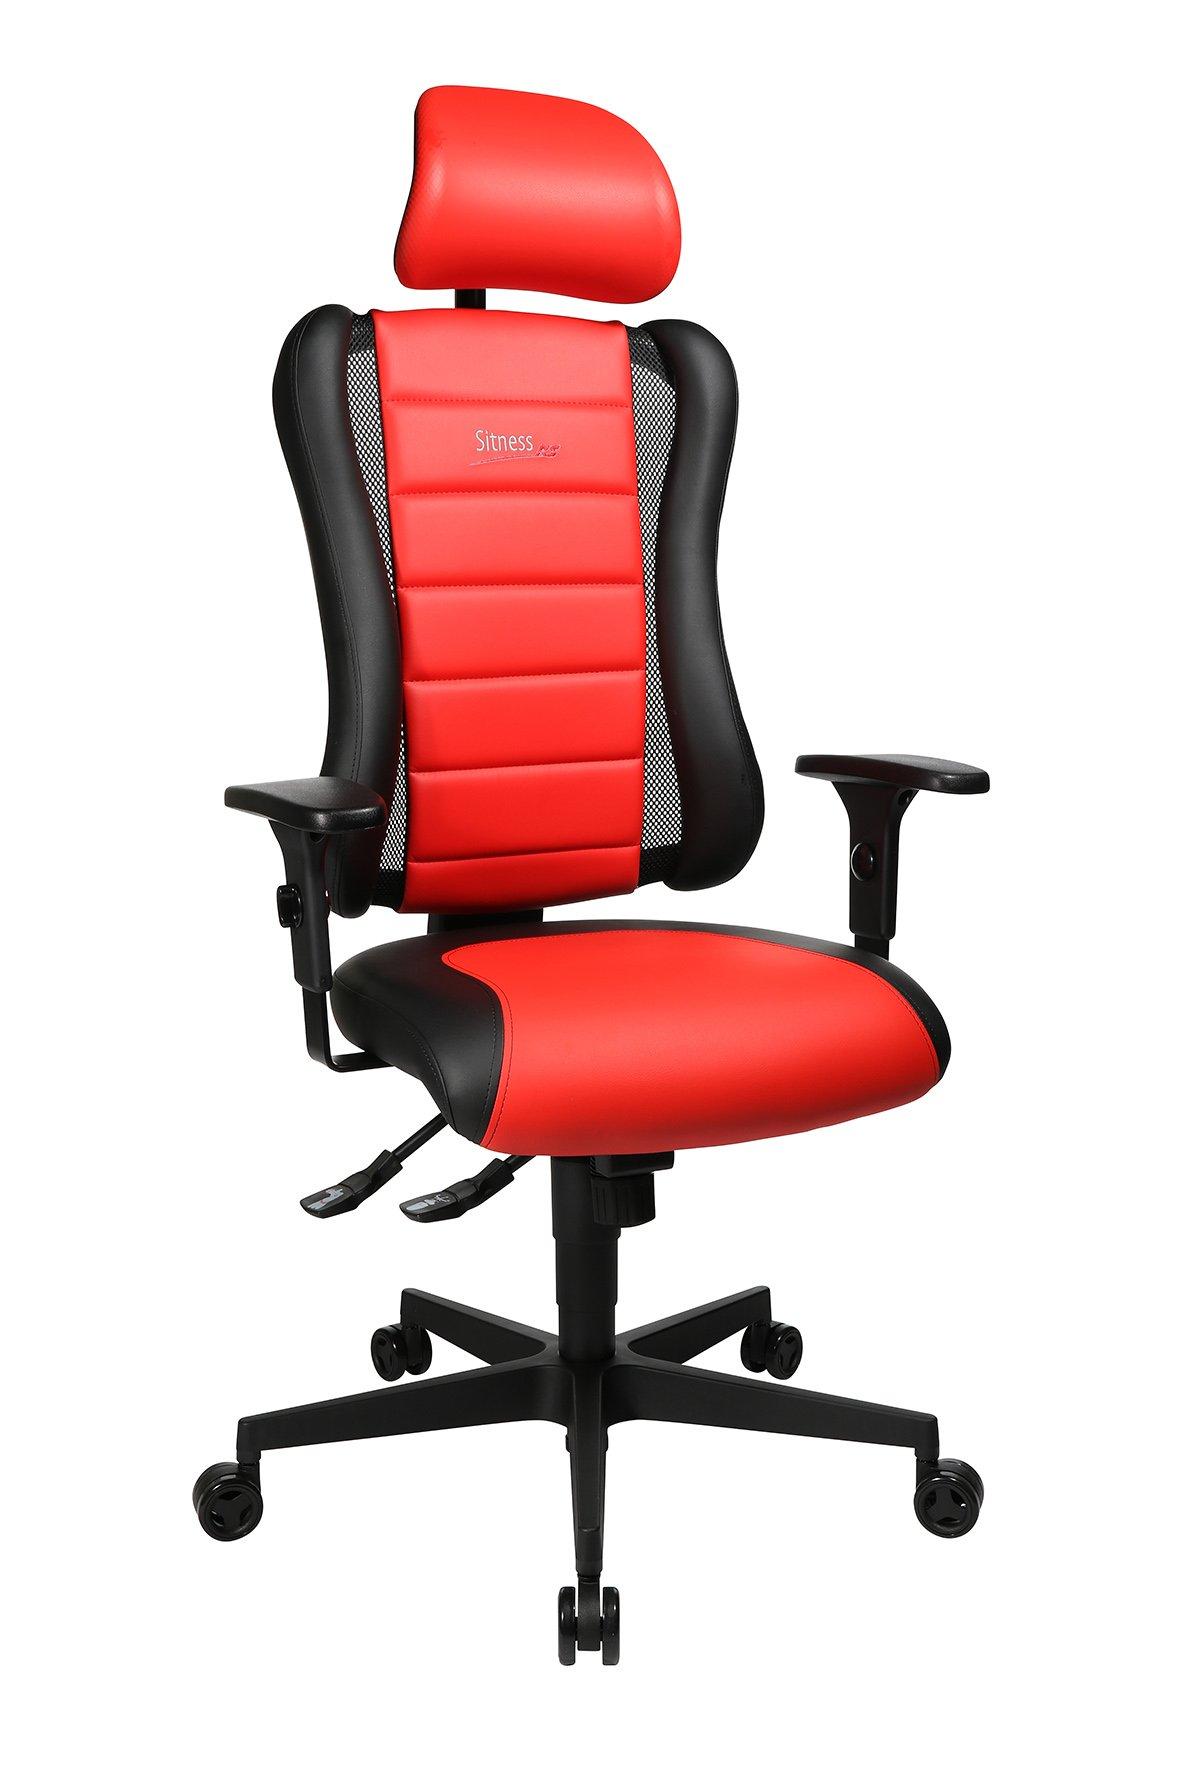 Drehstuhl Sitness RS,schwarz / rot,Kunststoff / Polyamid